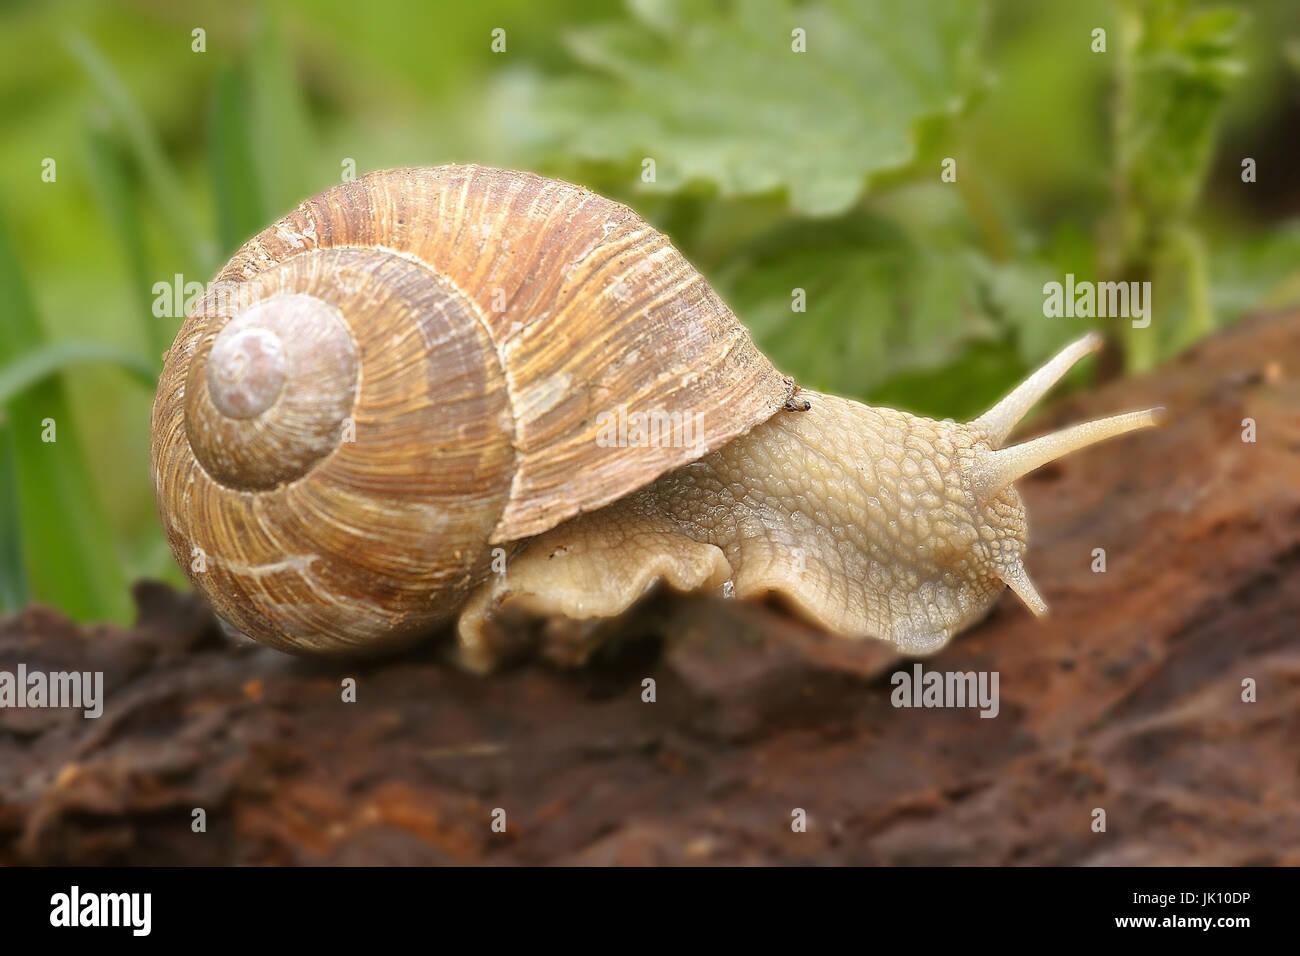 Edible snail i. Rhine meadow on the Lower Rhine, Weinbergschnecke i. Rheinaue am Niederrhein Stock Photo